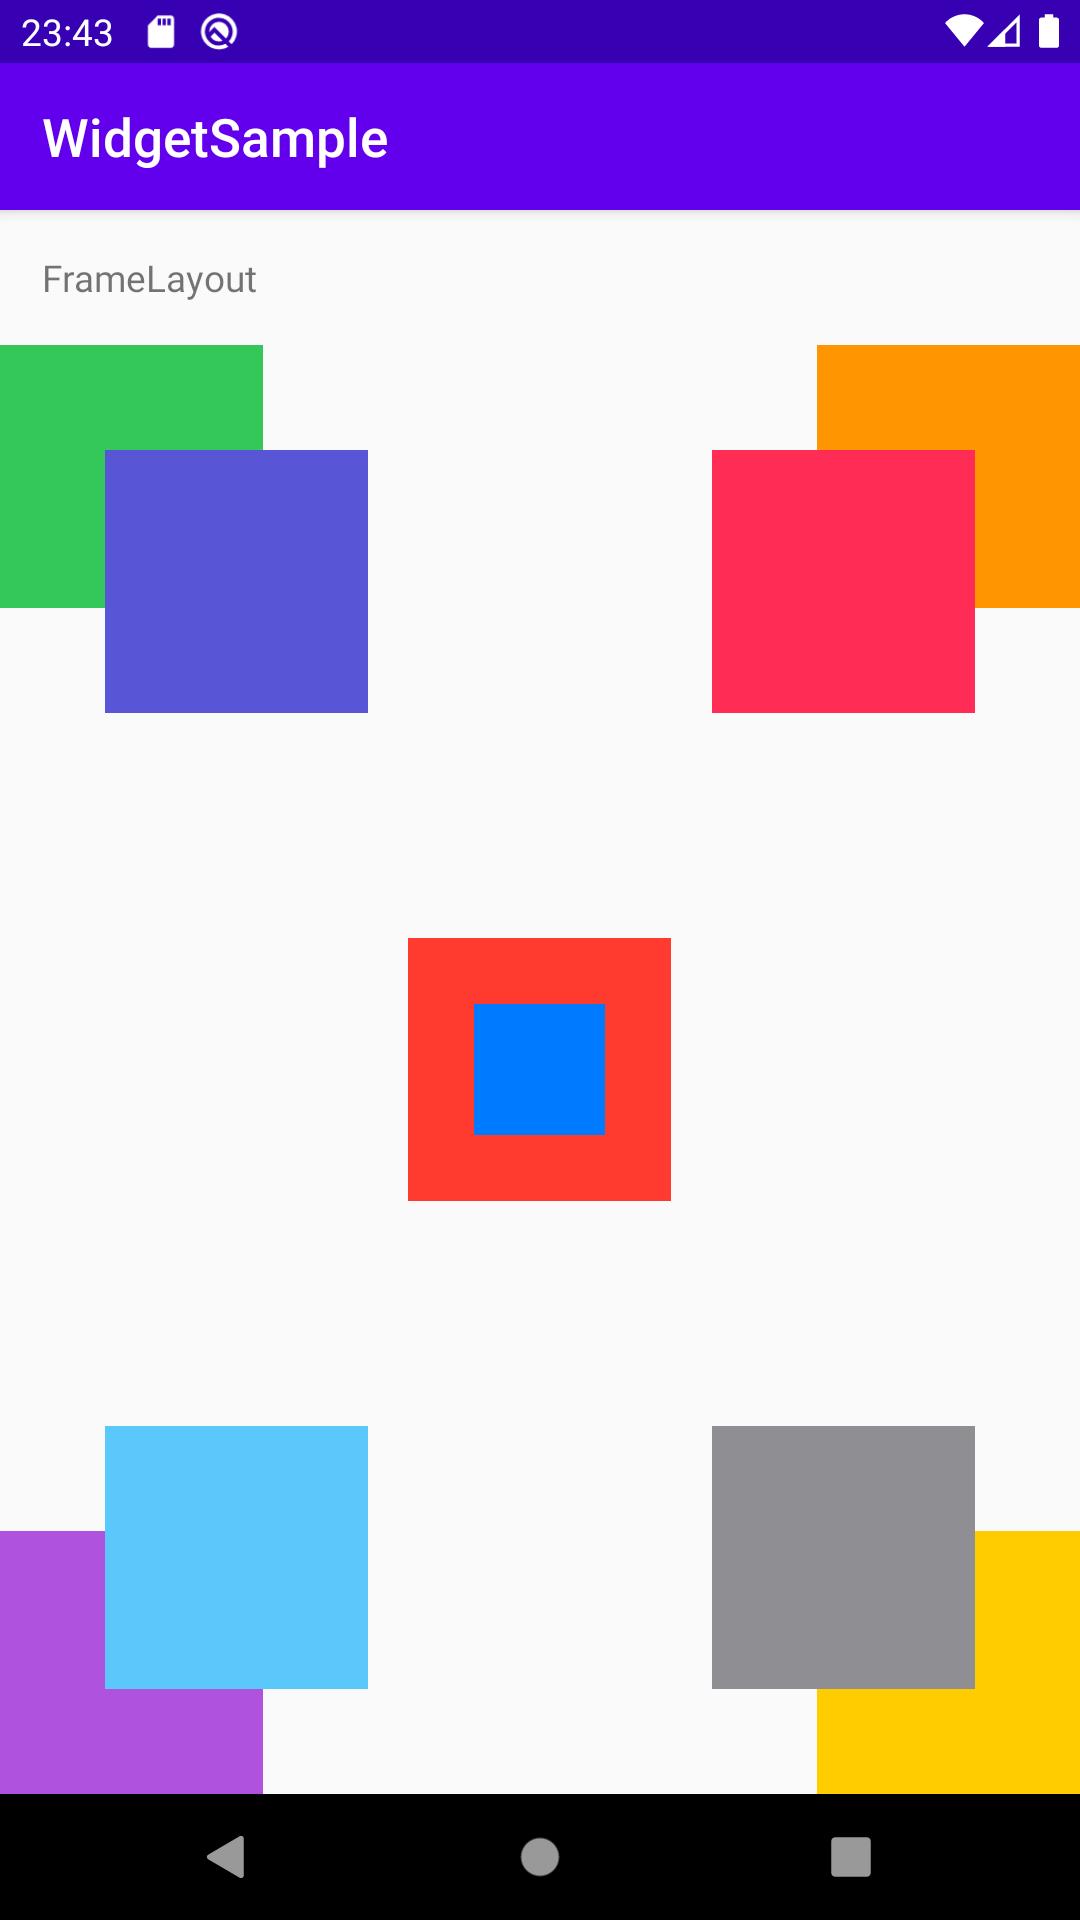 frame_layout